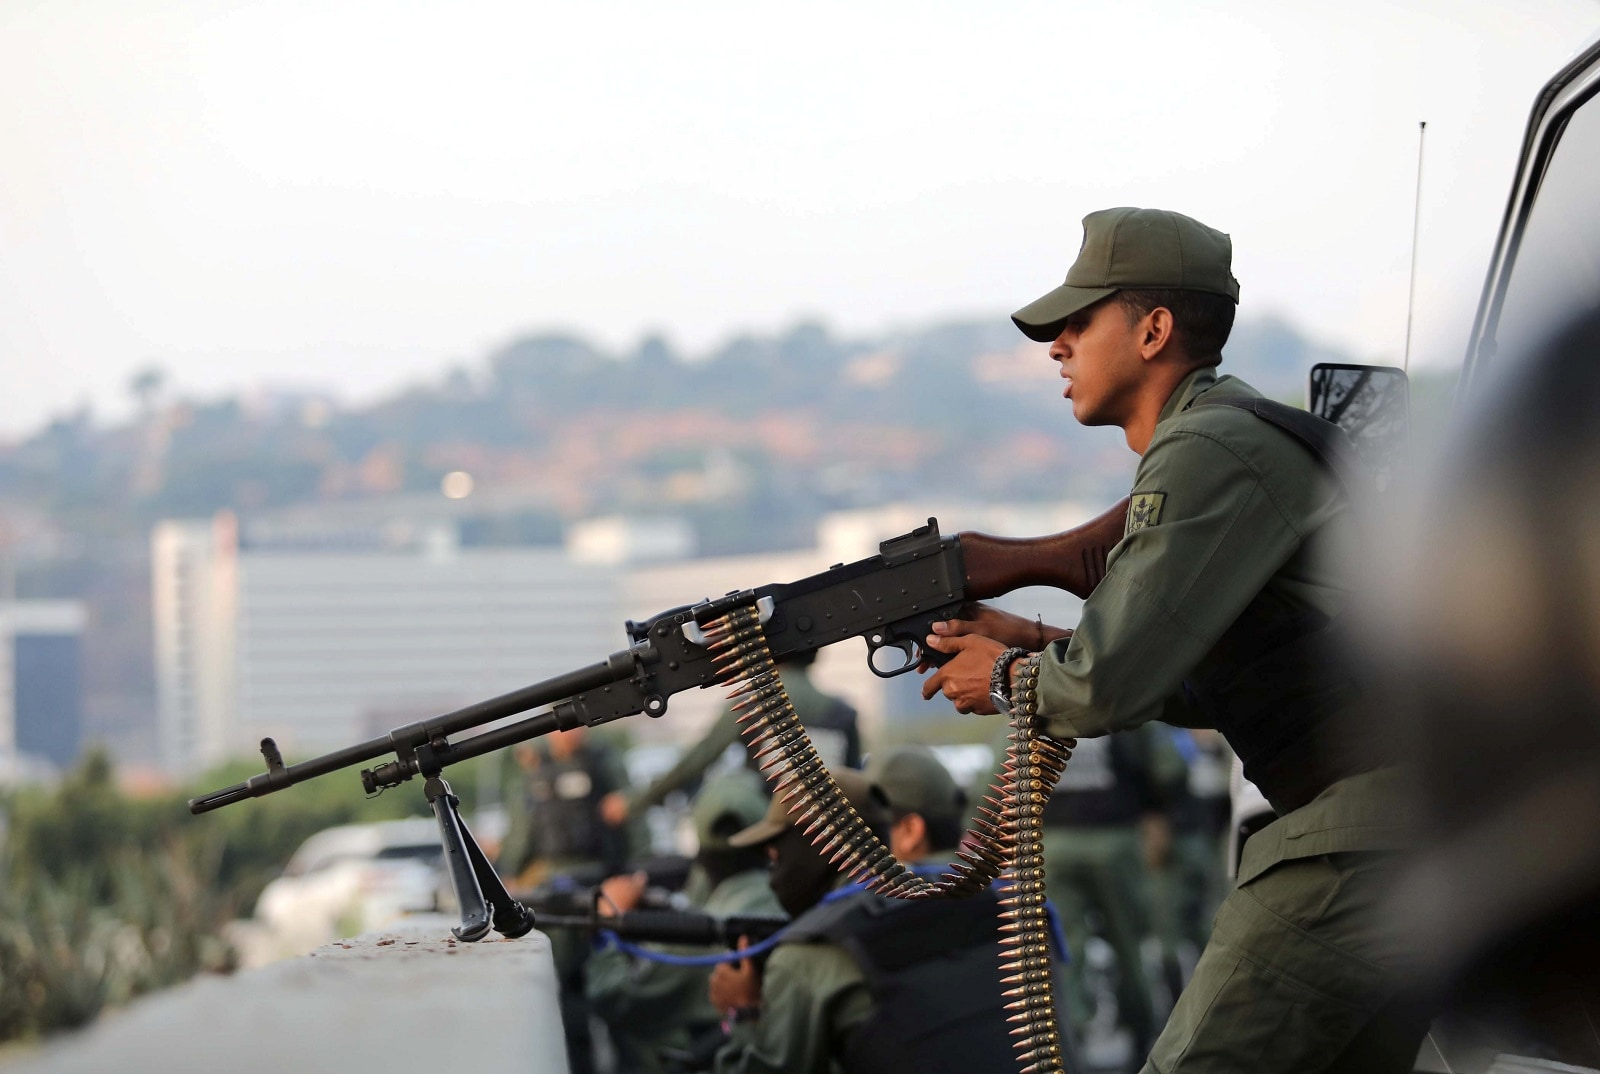 A military member aims a weapon near the Generalisimo Francisco de Miranda Airbase